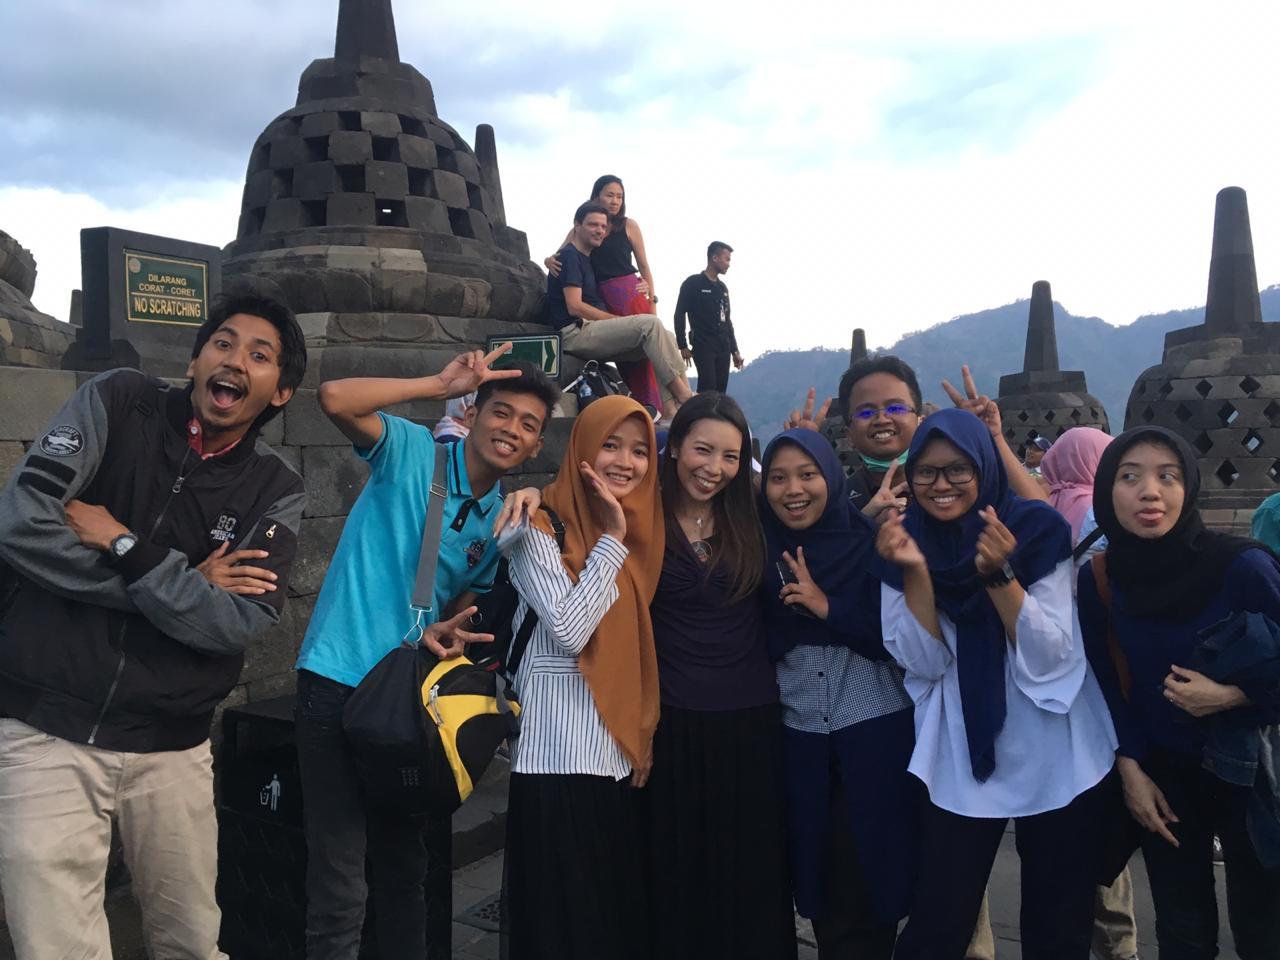 Kelompok Studi Bahasa Inggris Prodi Teknik Industri Berwisata Bersama Mahasiswa Exchange Asal Filipina